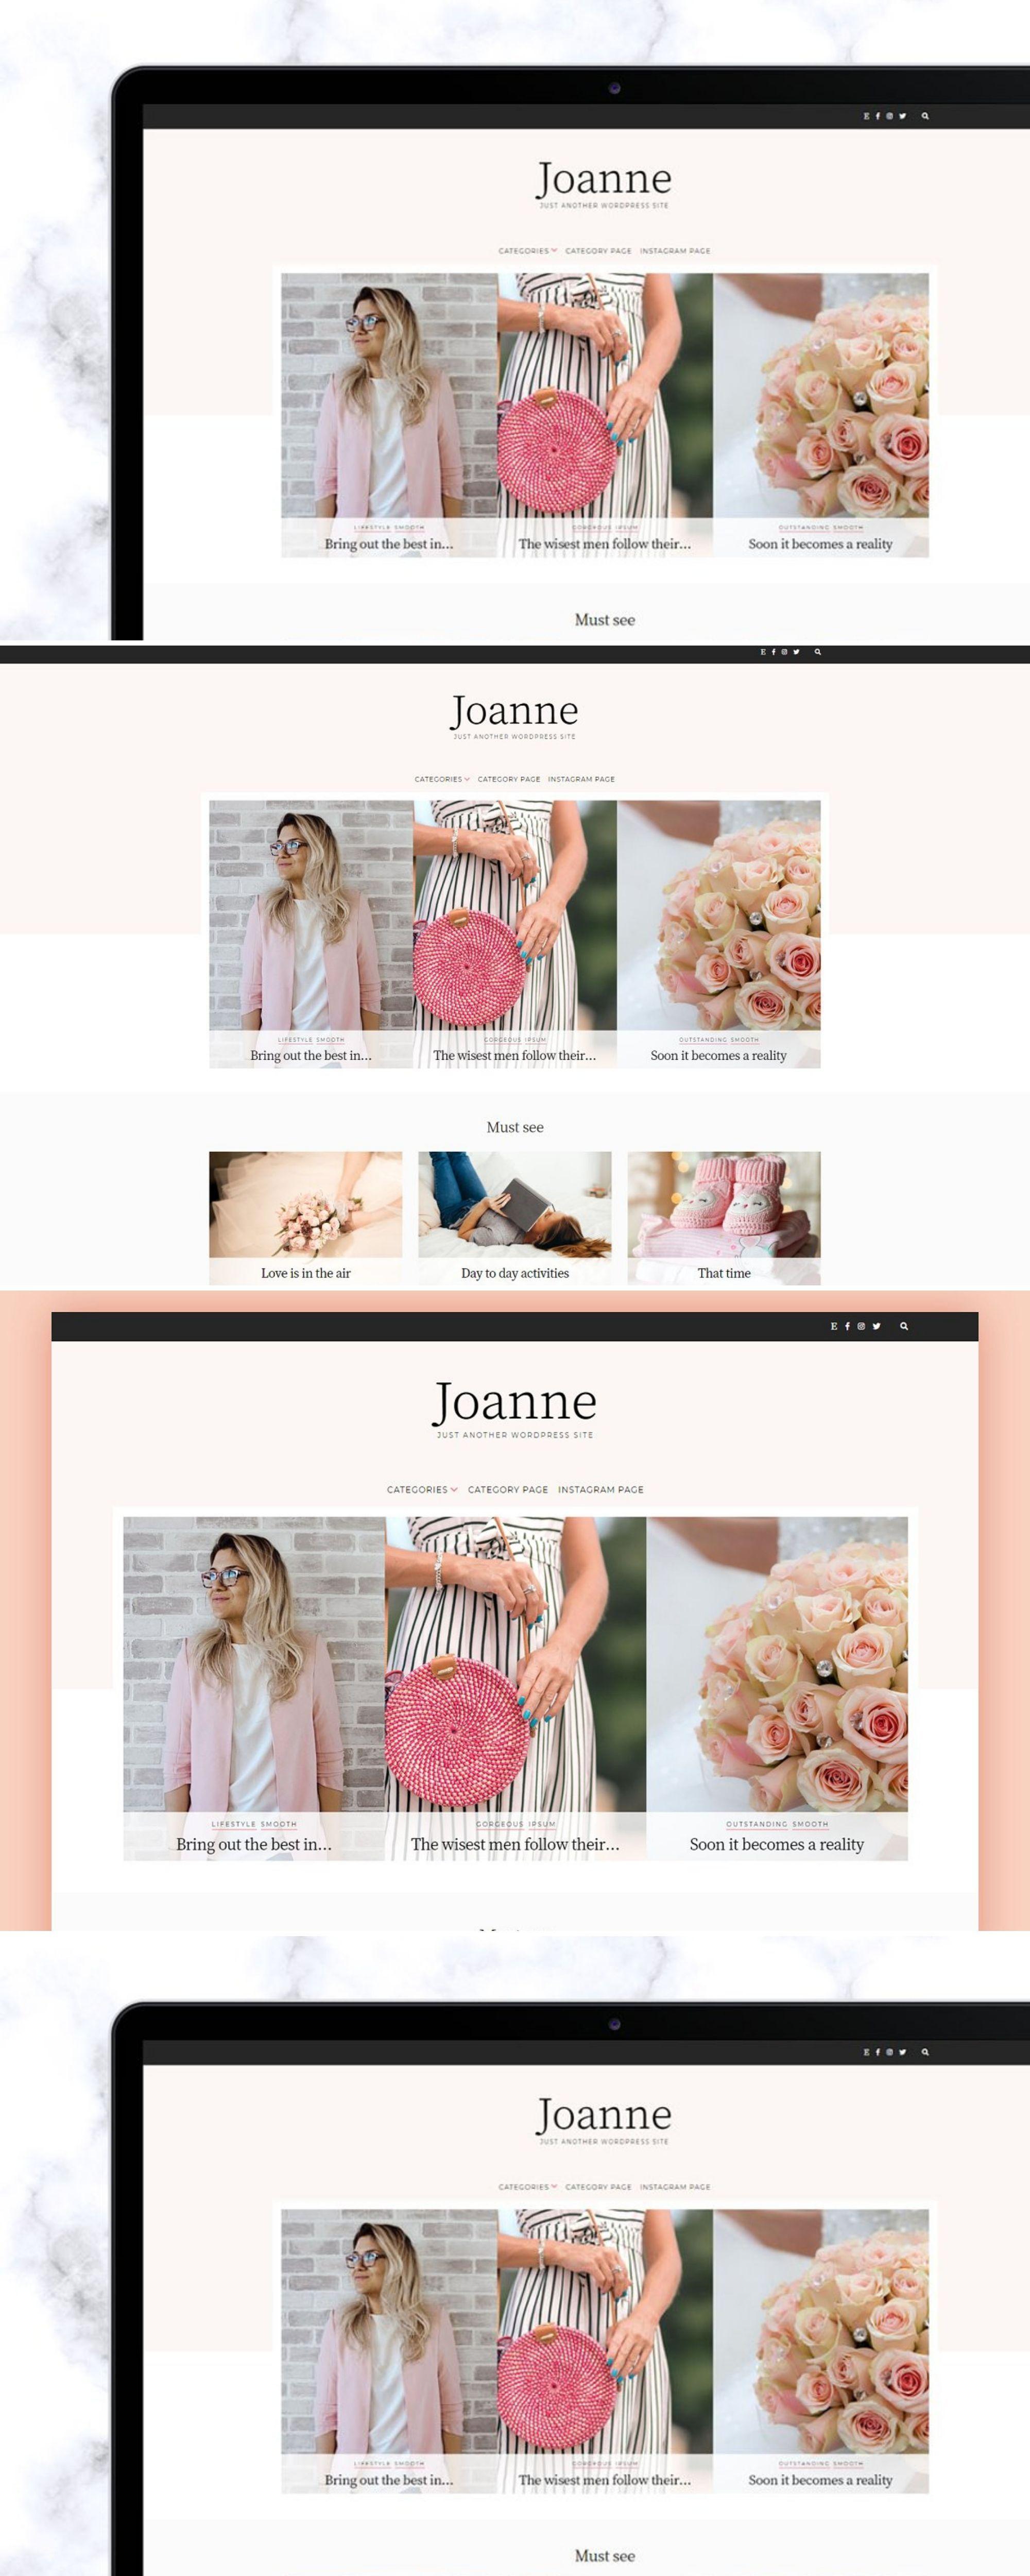 WordPress Blog Theme Joanne Social icons, Instagram